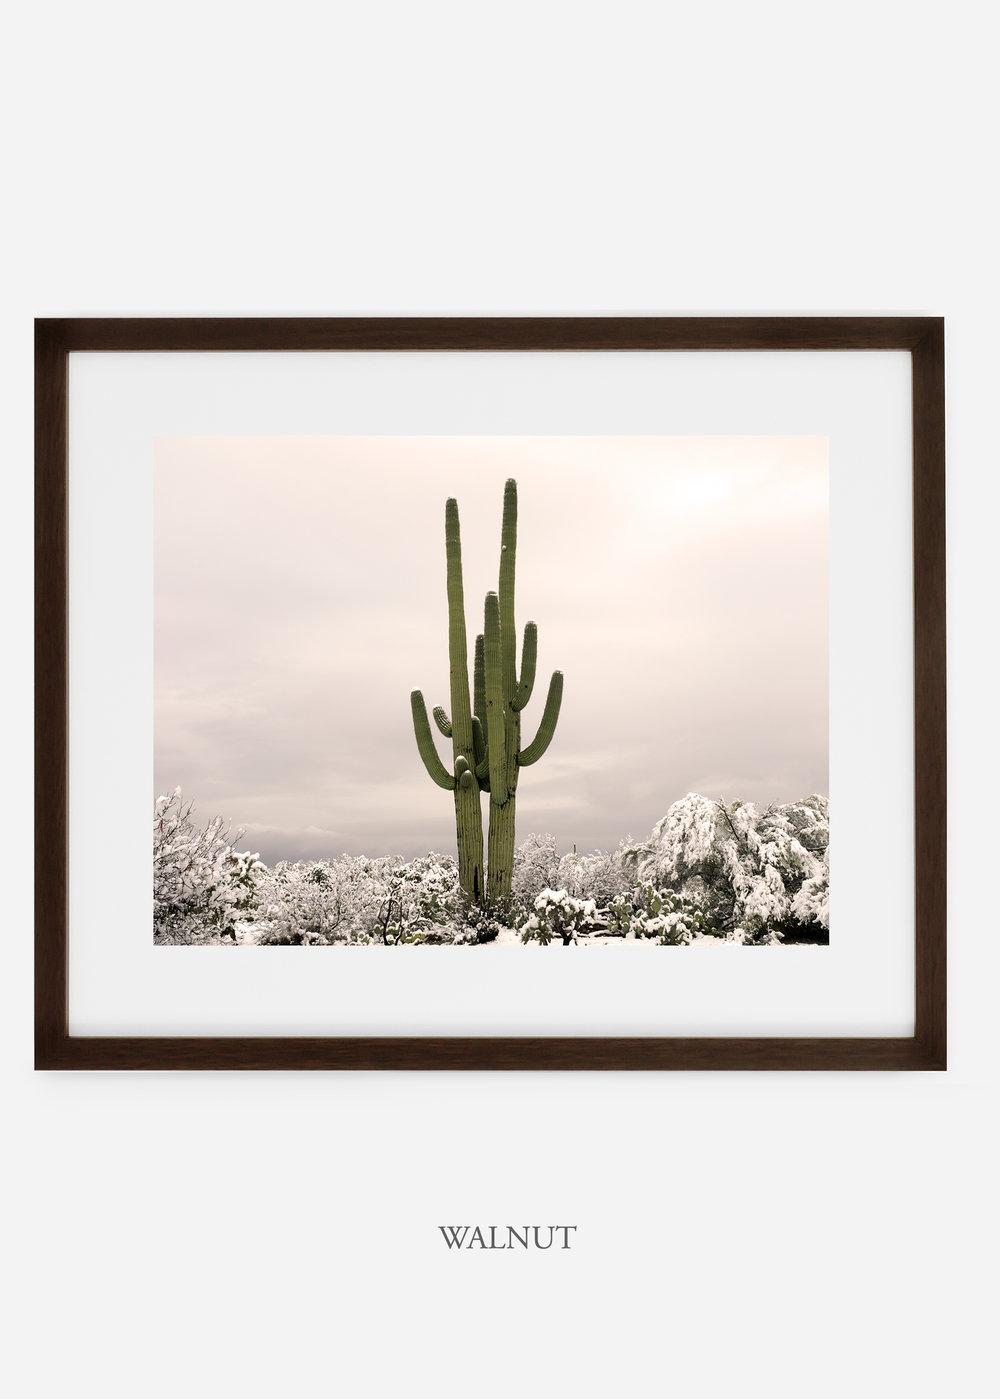 walnutframe-saguaroNo.5-wildercalifornia-art-wallart-cactusprint-homedecor-prints-arizona-botanical-artwork-interiordesign.jpg